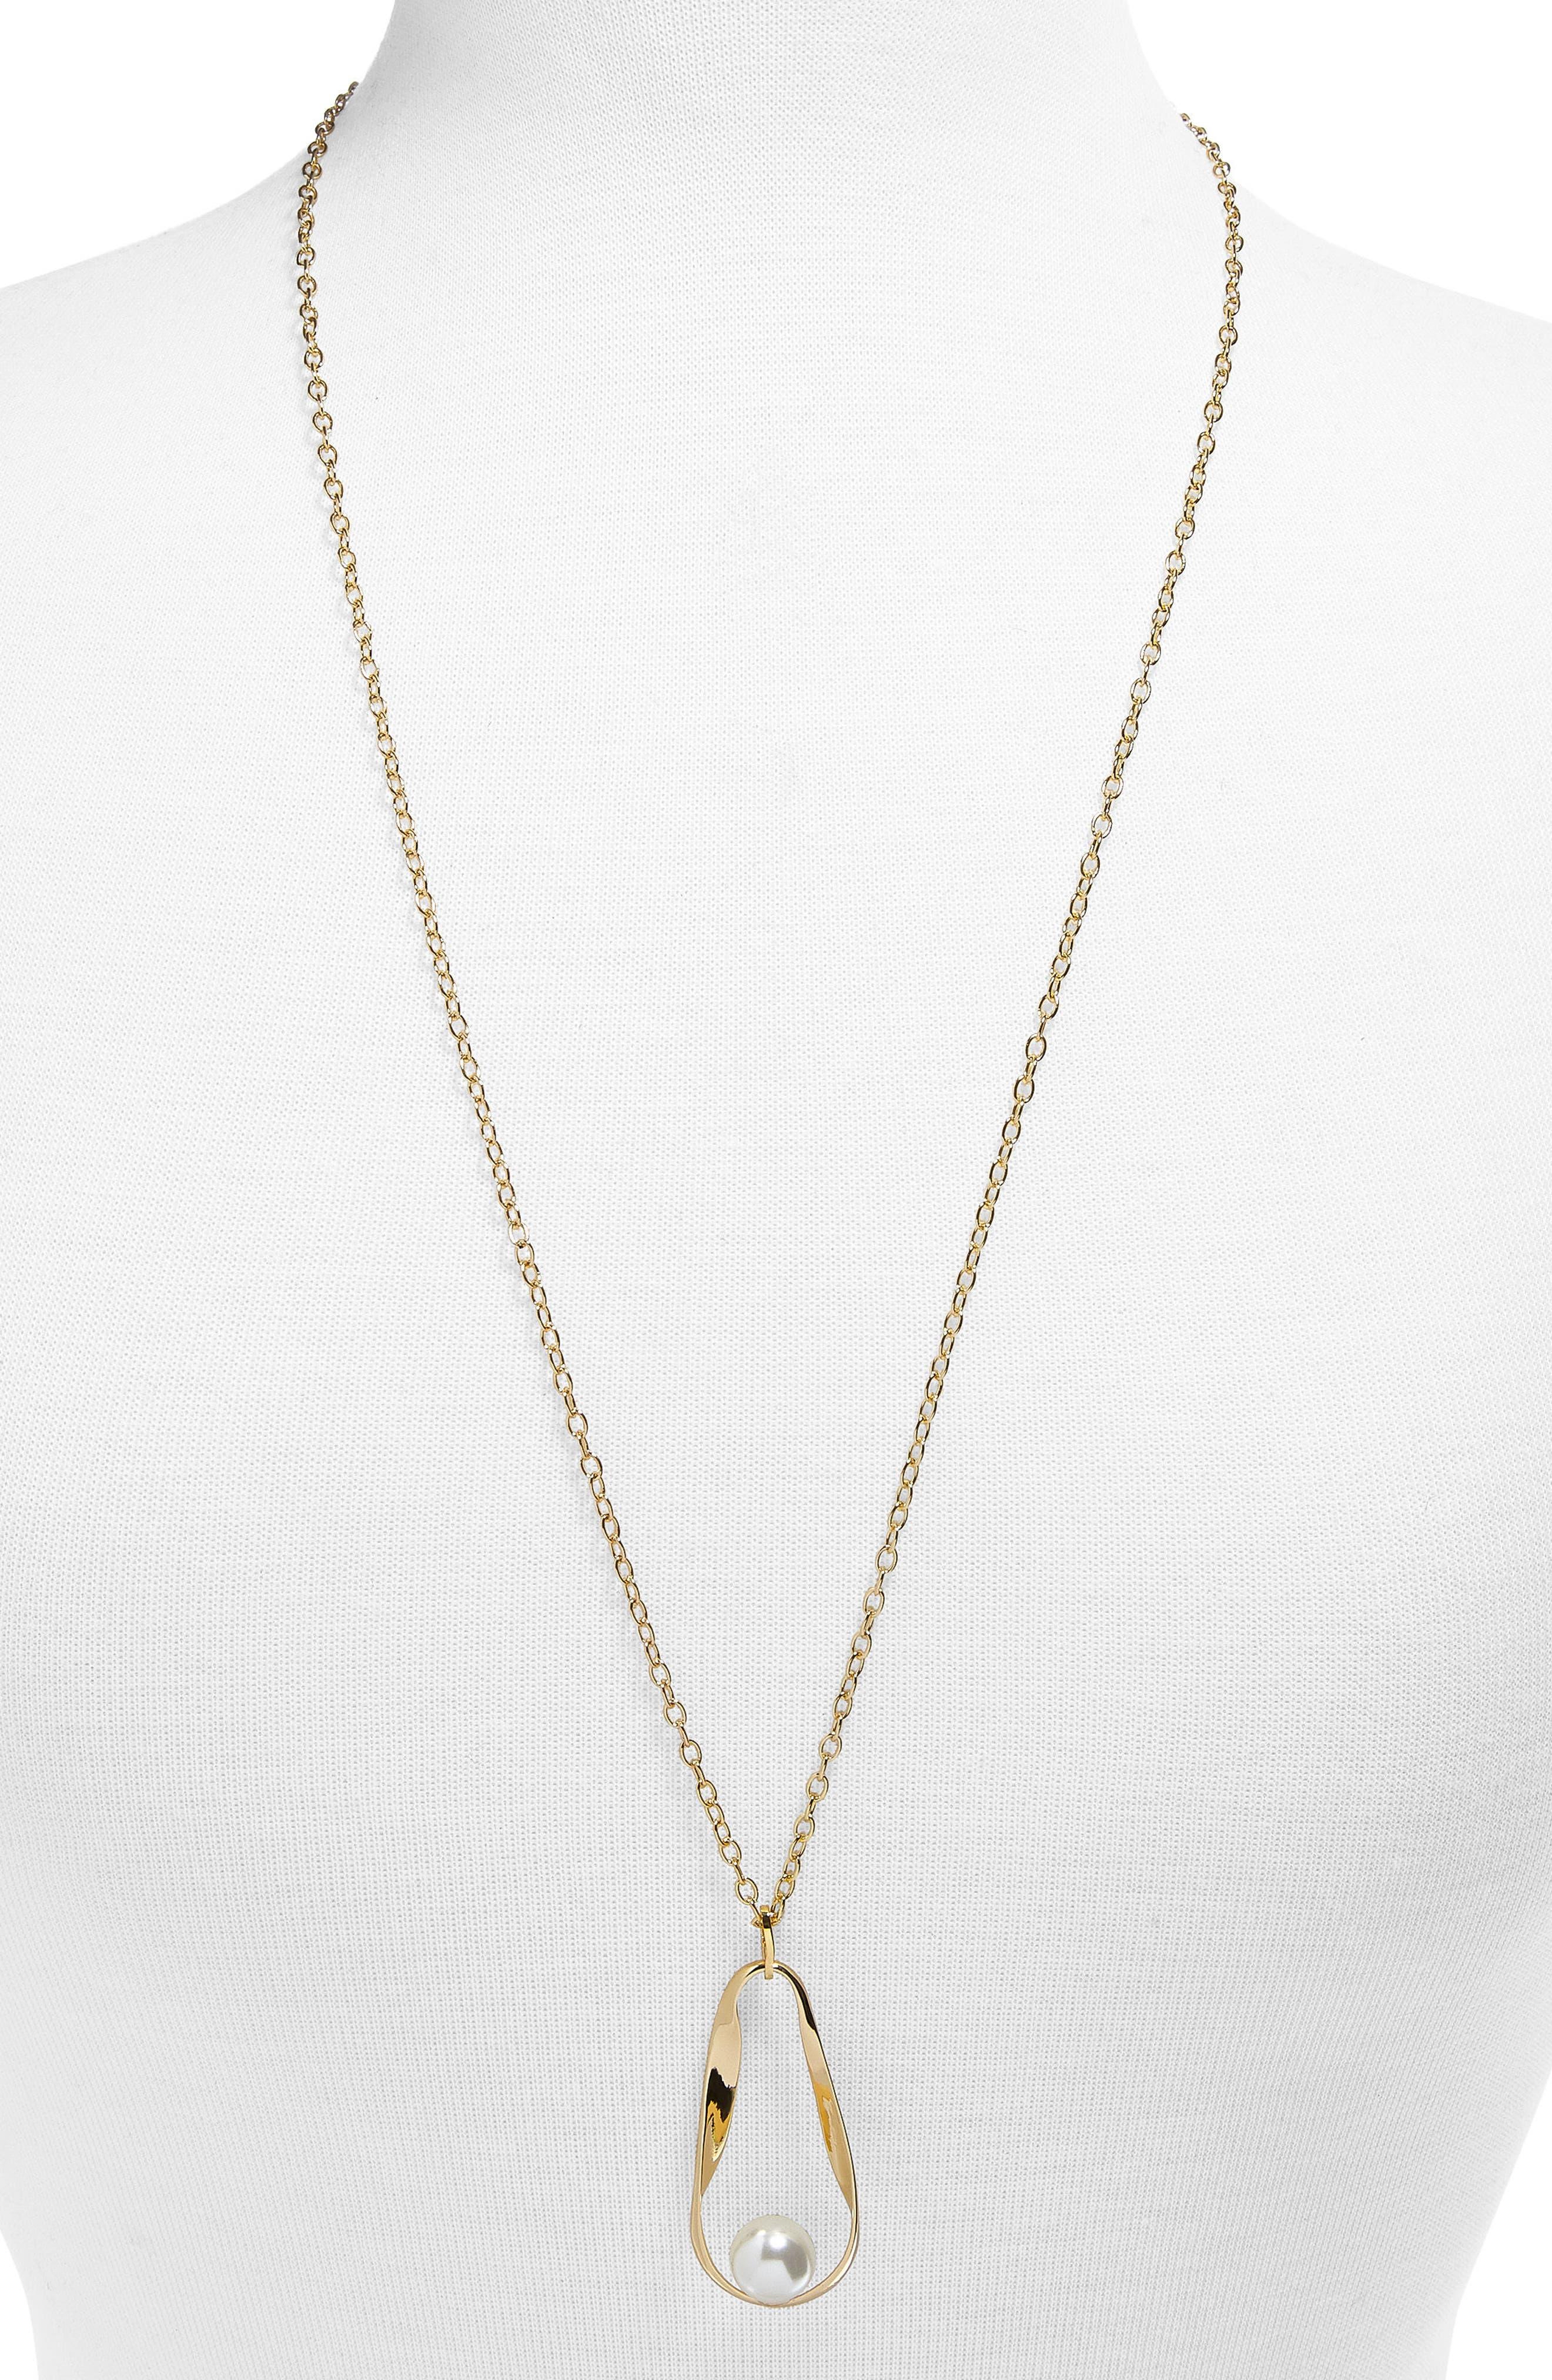 Stasia Imitation Pearl Pendant Necklace,                         Main,                         color, Pearl